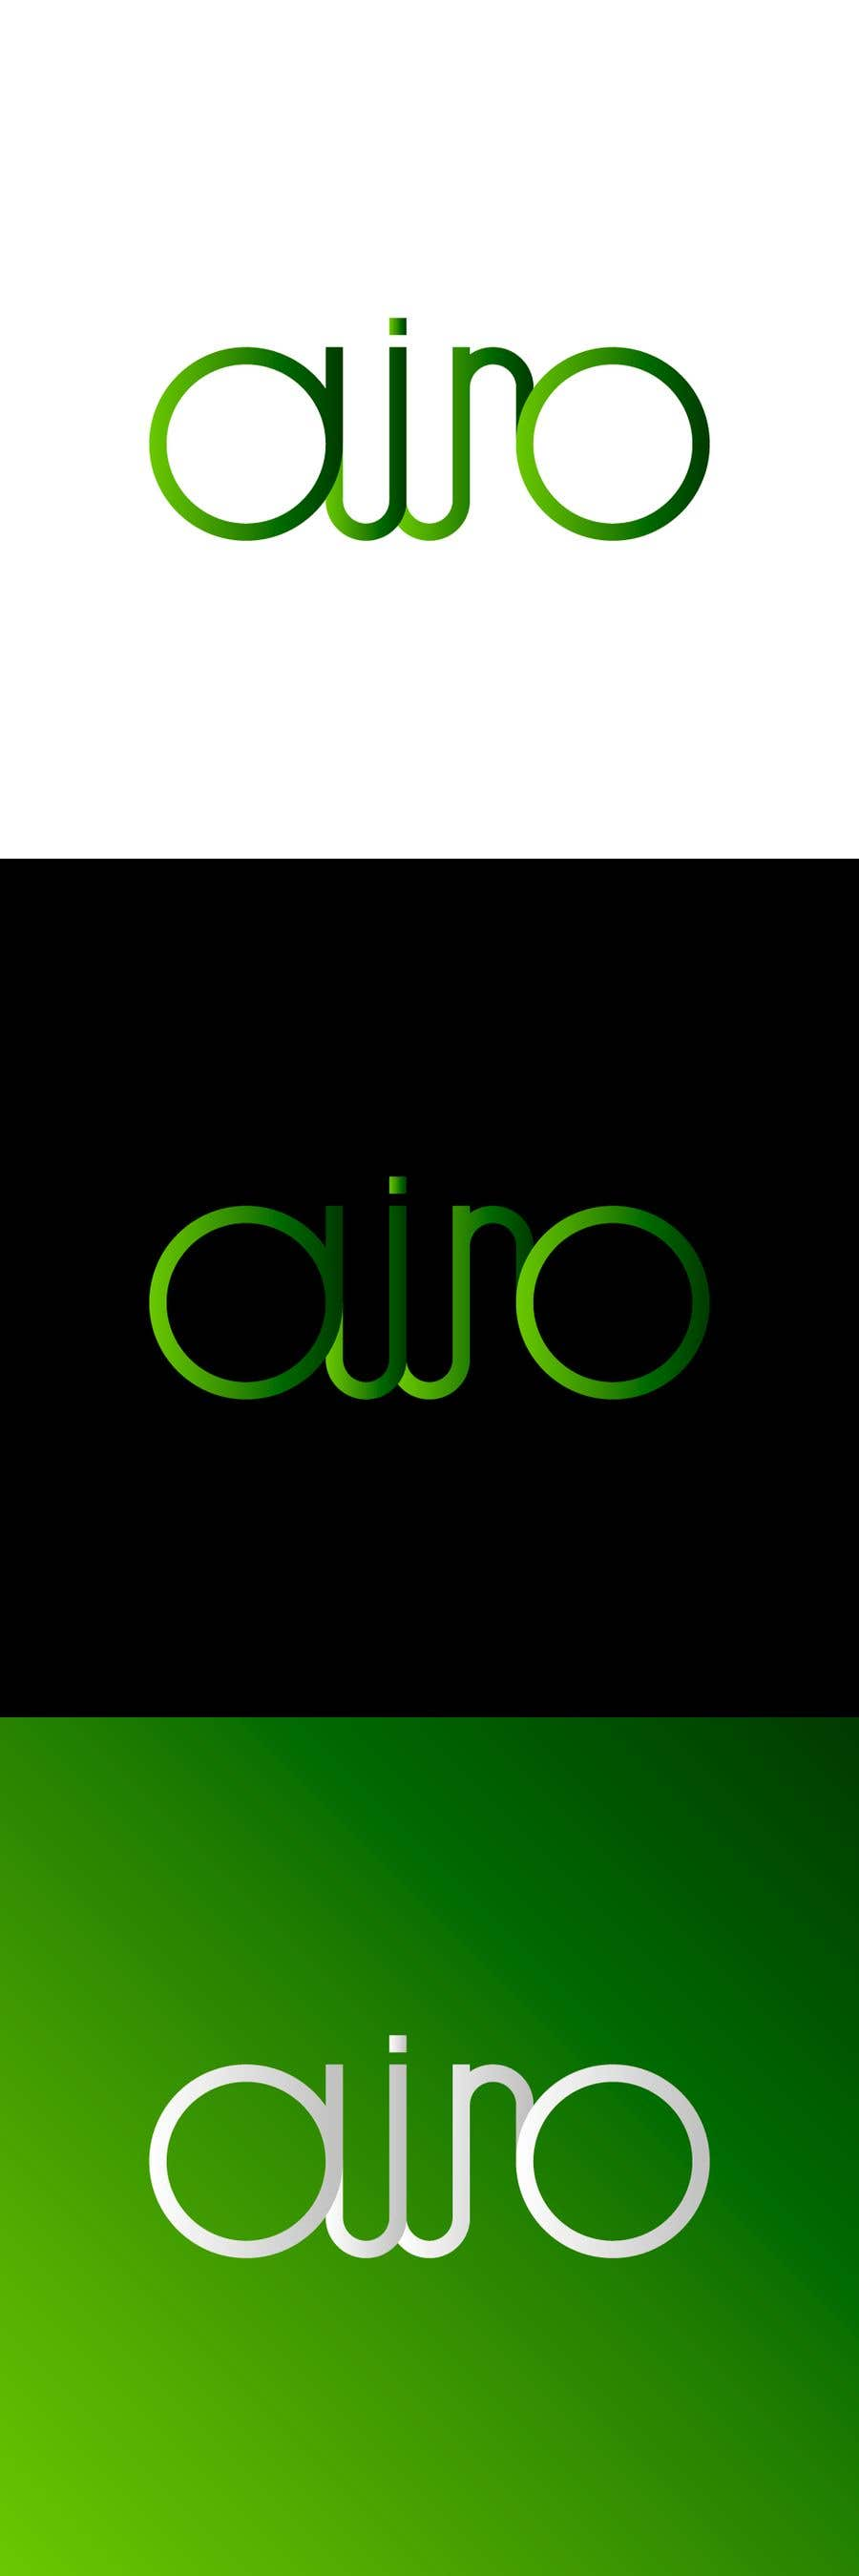 Proposition n°84 du concours Logo for Airo